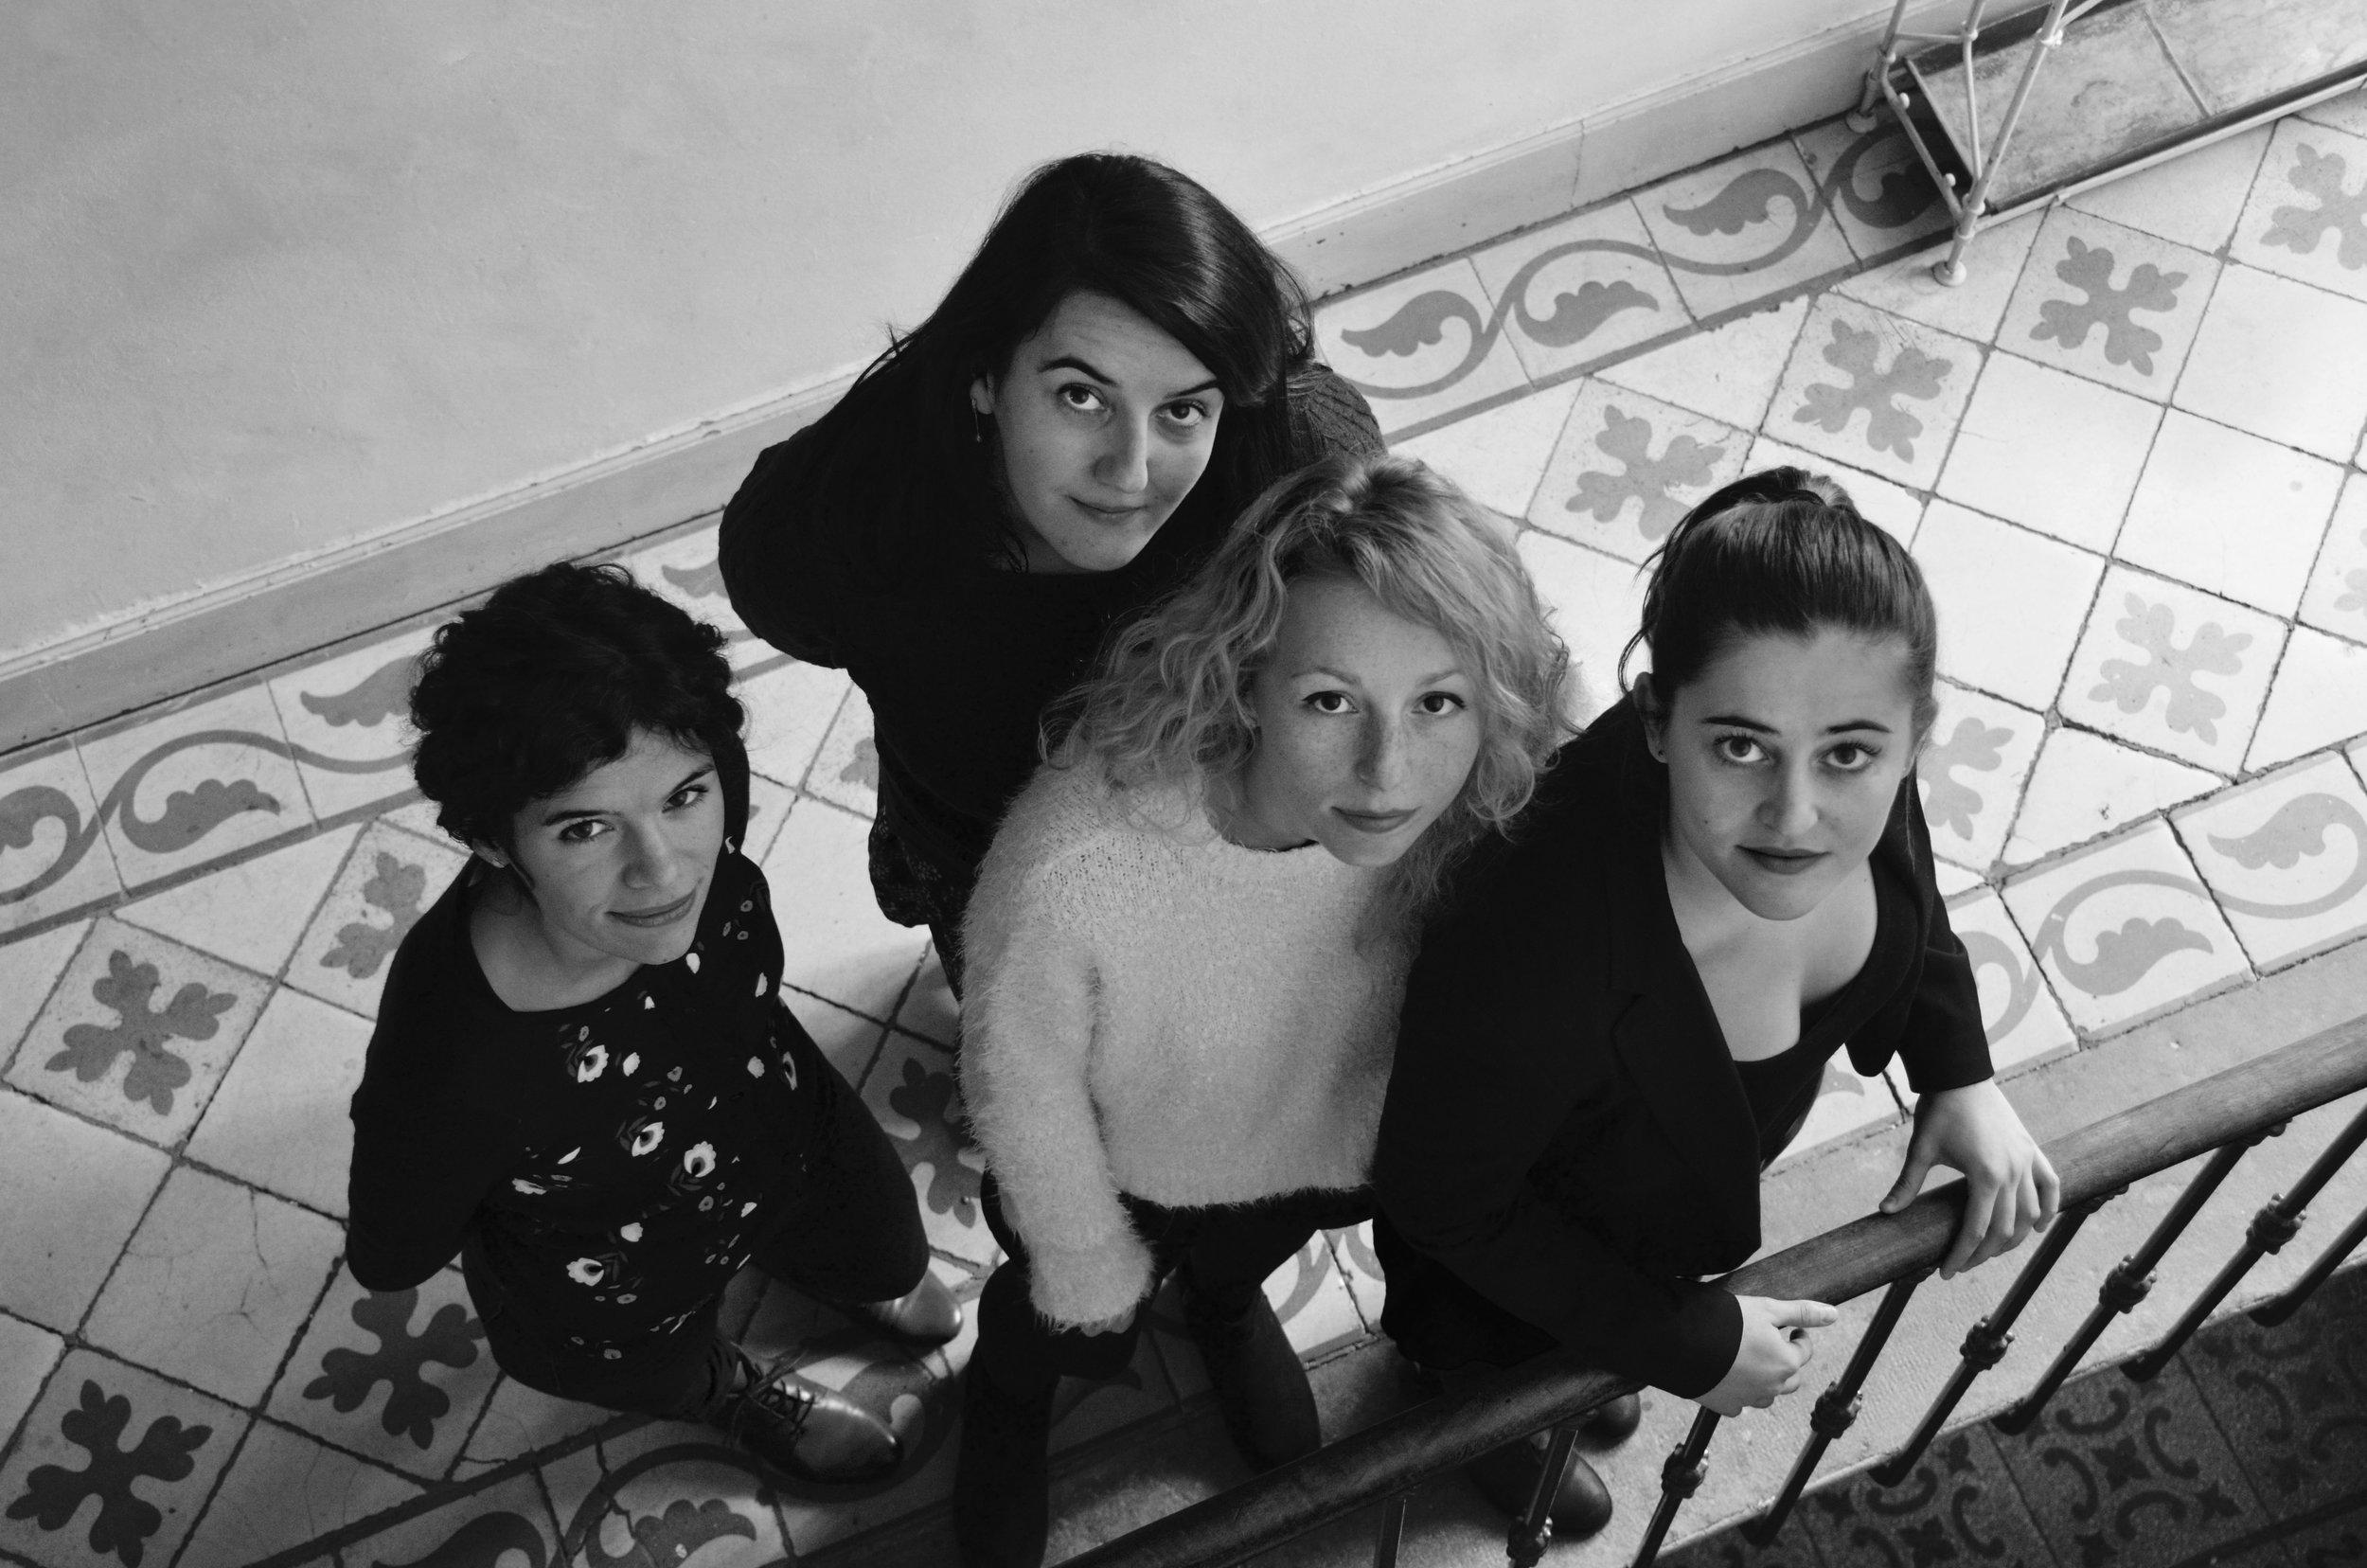 Laurence Verant, Louise Mercier-Gilles, Jodyline Gallavardin, Gabrielle Jardin